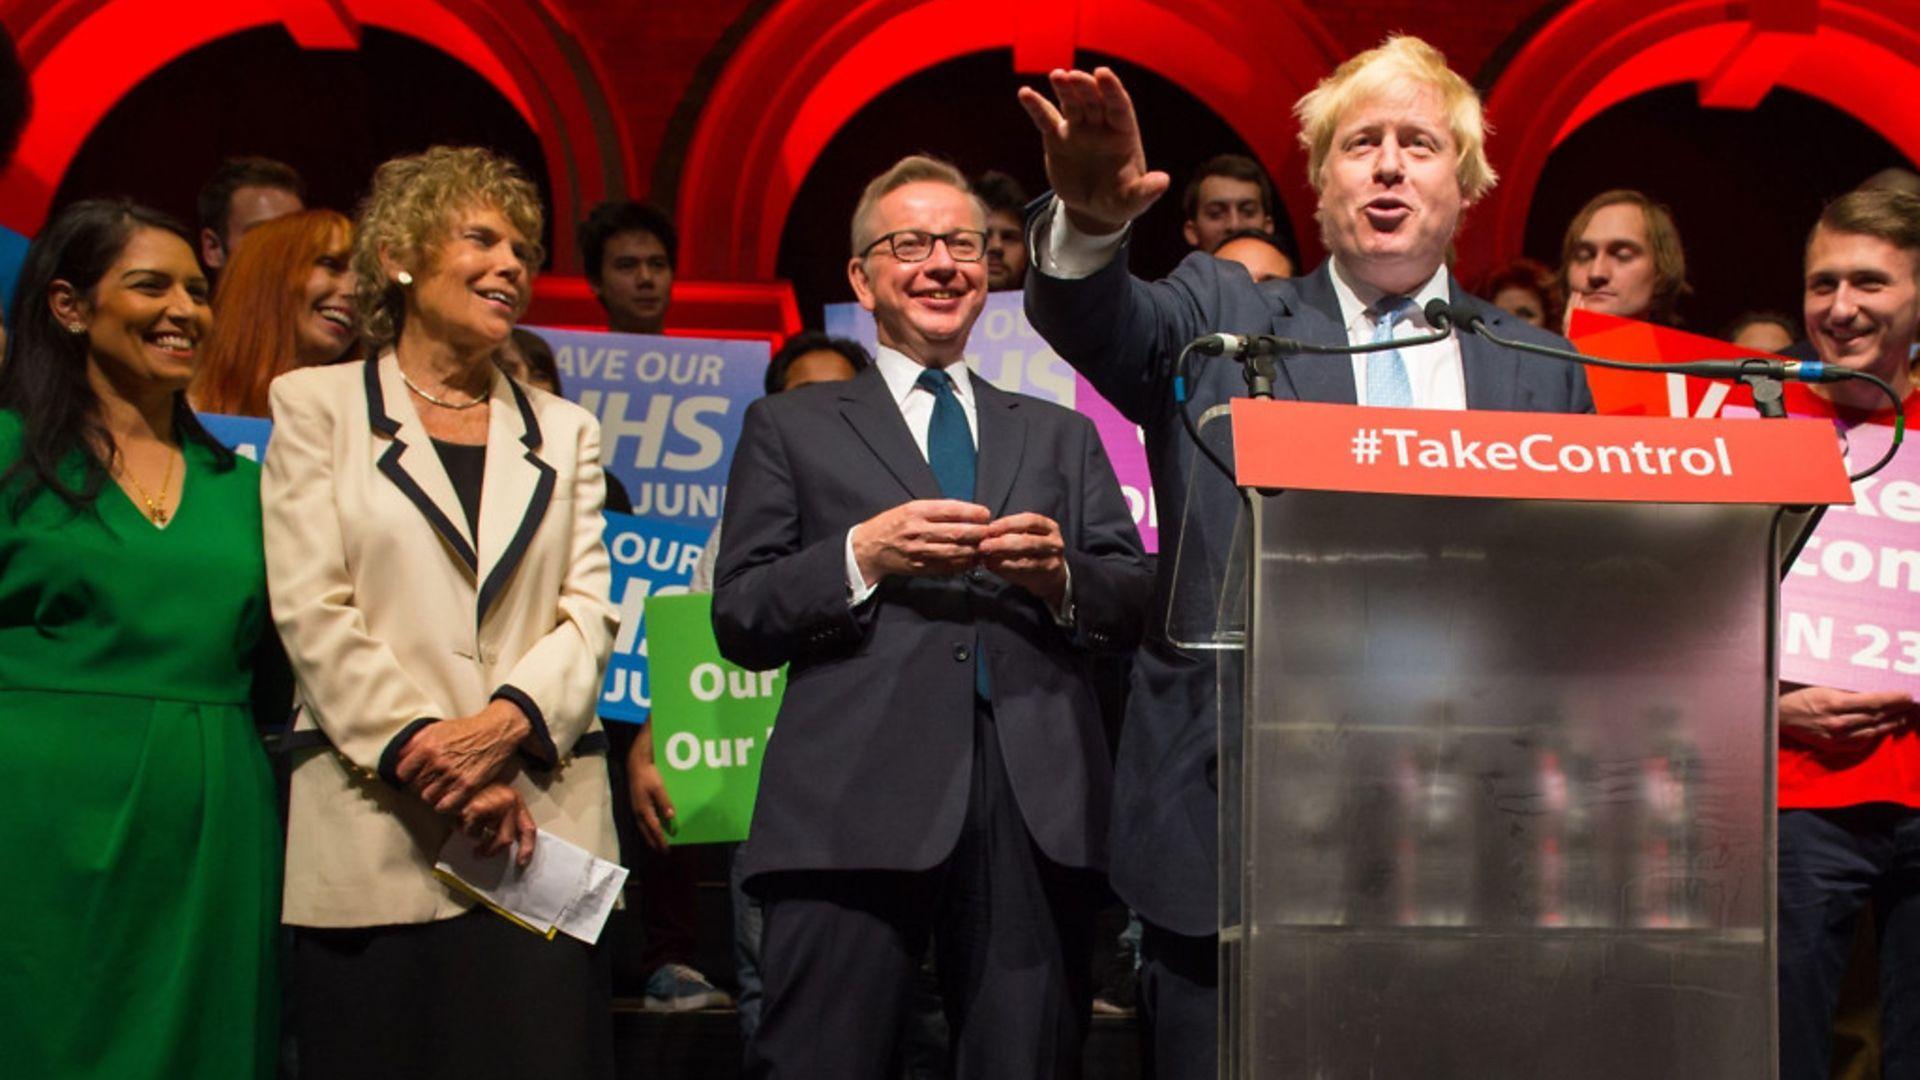 Boris Johnson (right) speaks alongside (from left to centre) Priti Patel, Kate Hoey and Michael Gove. - Credit: Dominic Lipinski/PA